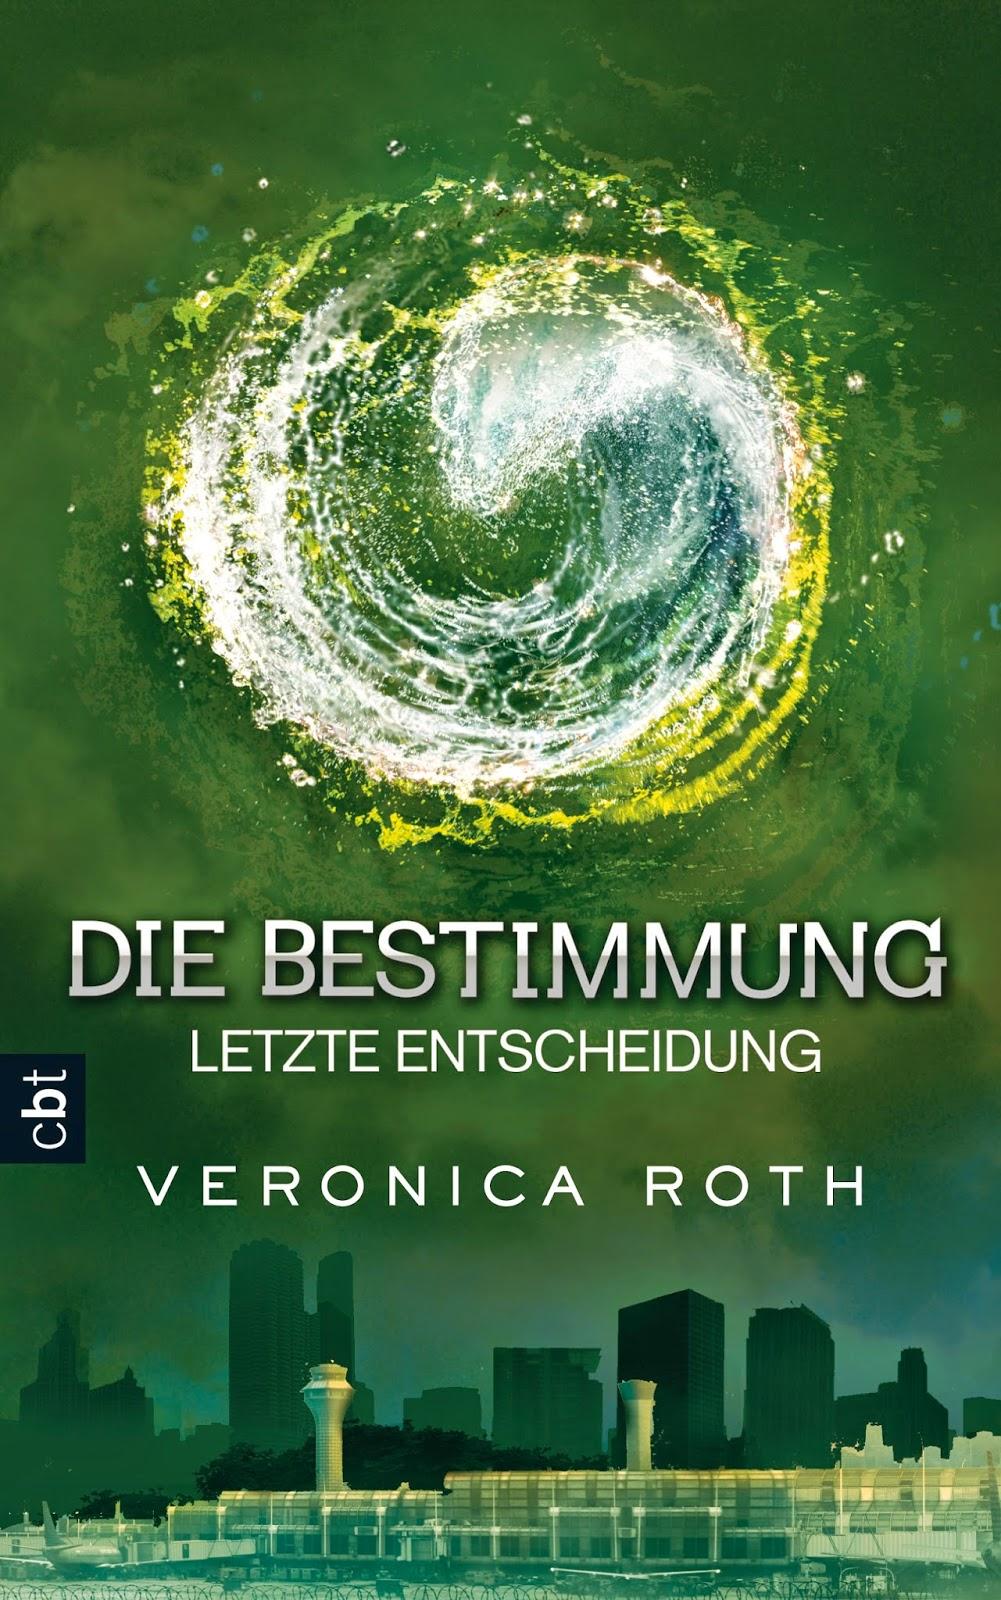 http://www.randomhouse.de/Buch/Die-Bestimmung-Letzte-Entscheidung-Band-3/Veronica-Roth/e384363.rhd;jsessionid=4D1A4FB802B0BAEE0562863F1024E3B0.mainworker